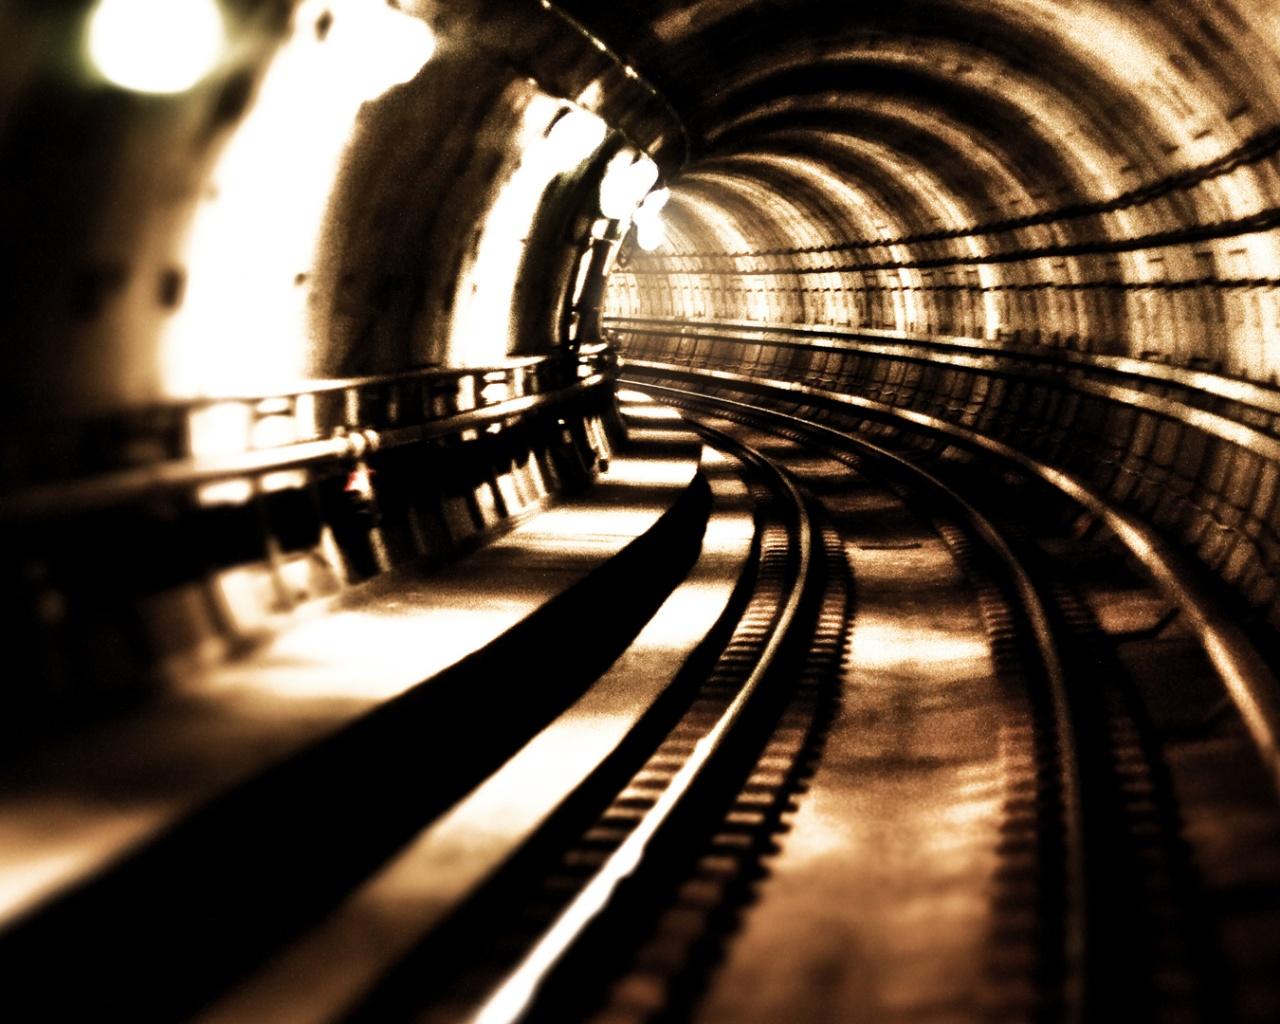 kreativnie_oboi_tunnel_metro_podzemka_90882978011.jpg